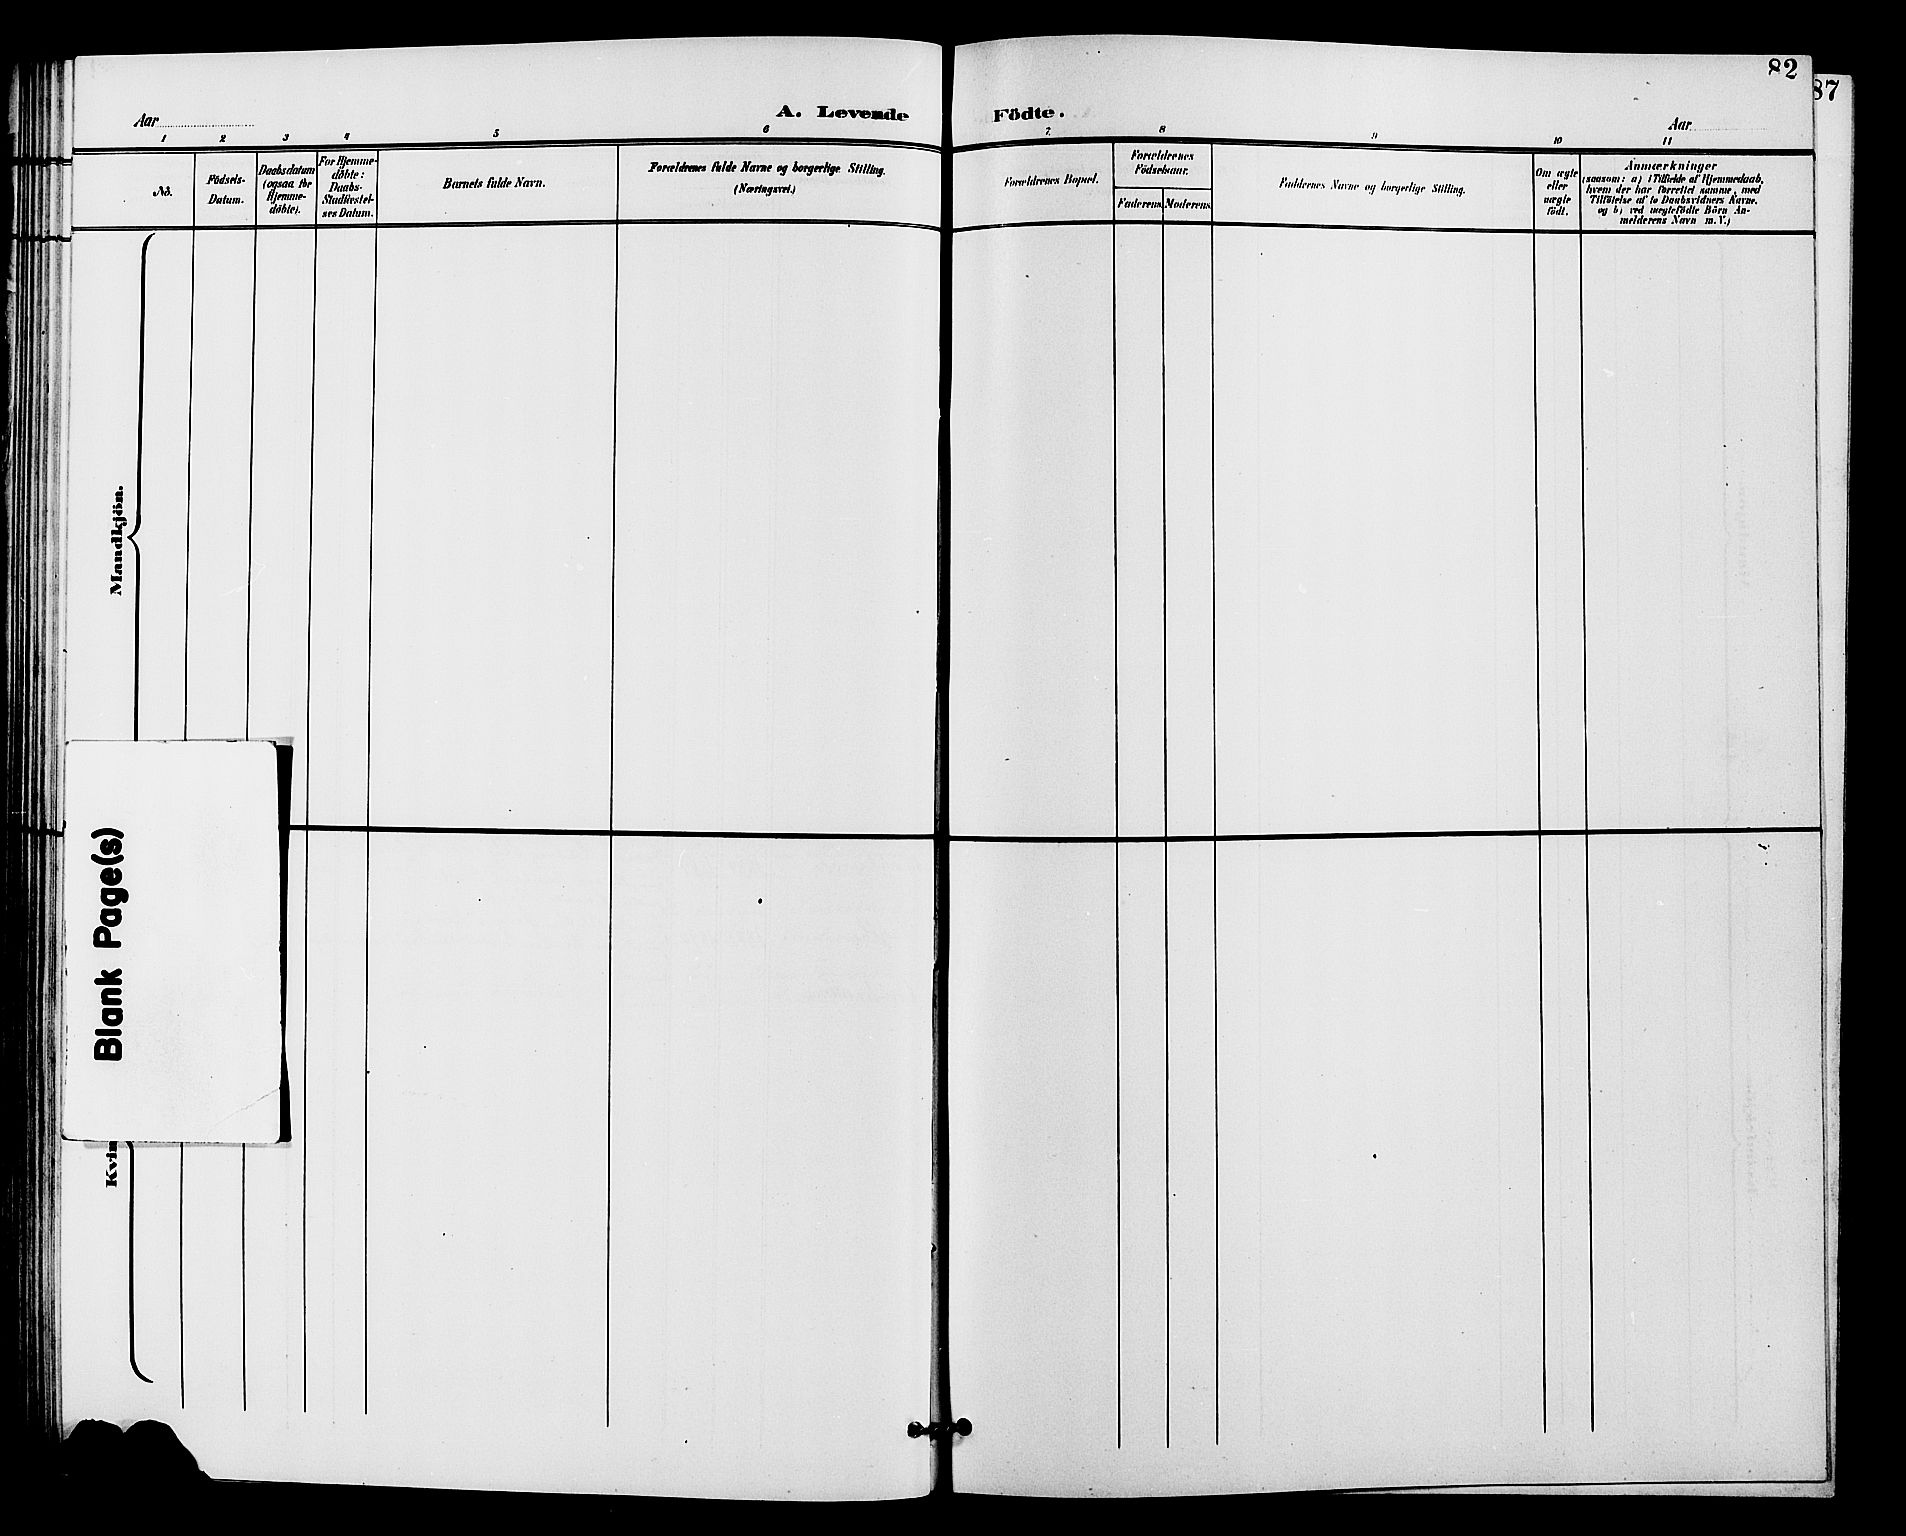 SAH, Vardal prestekontor, H/Ha/Hab/L0011: Klokkerbok nr. 11, 1899-1913, s. 82